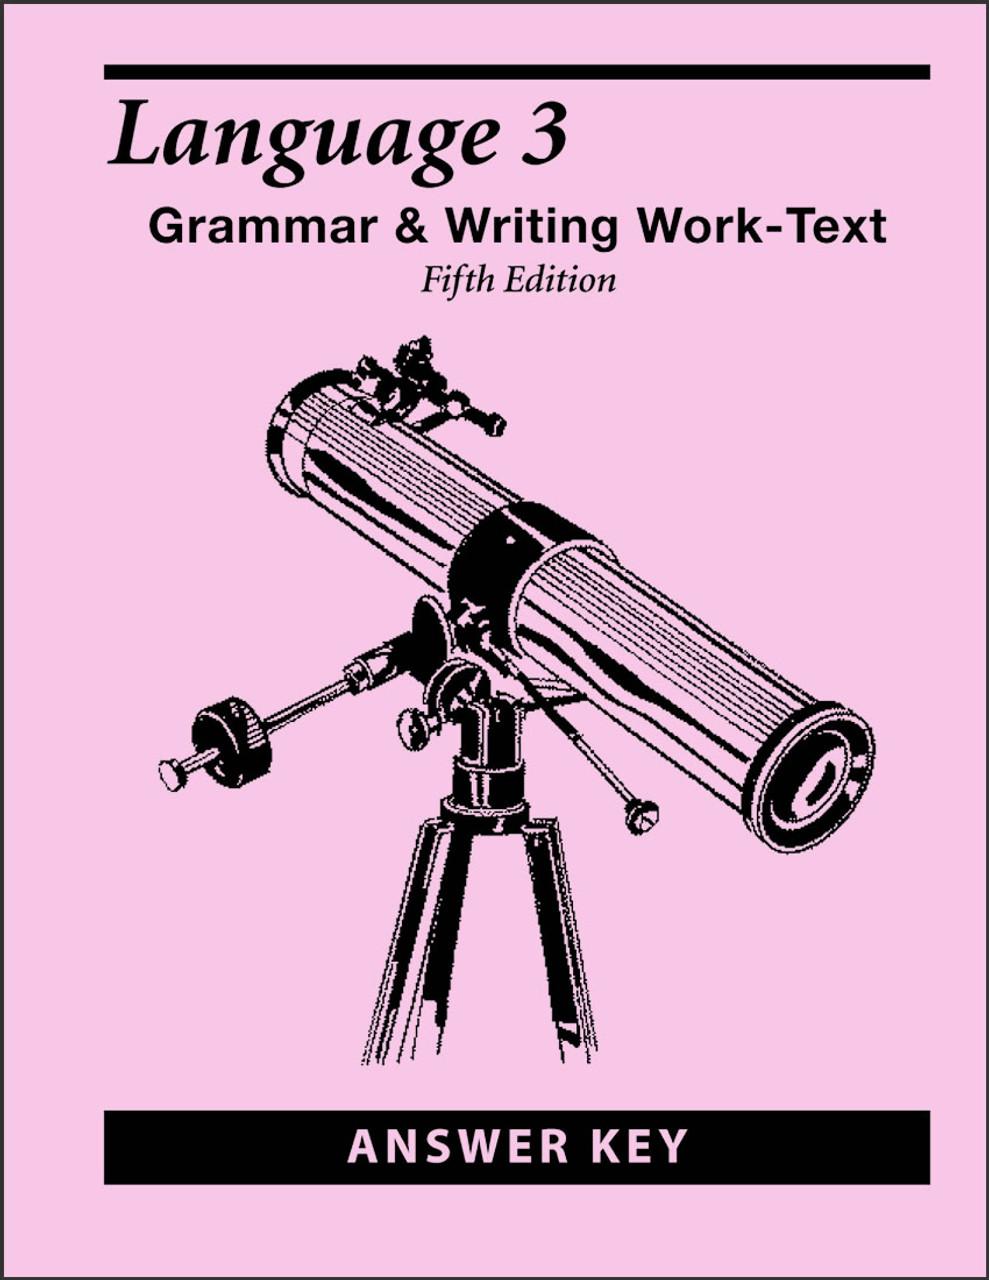 Language 3, 5th edition - Answer Key